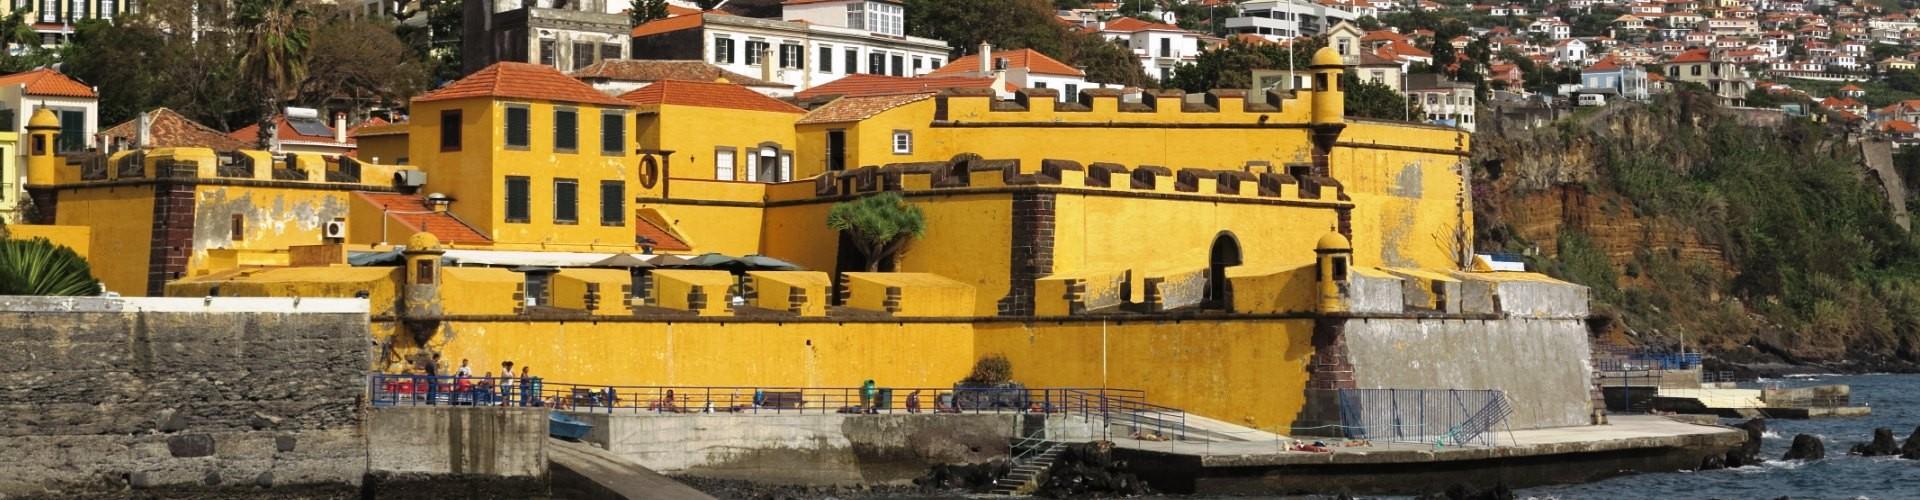 Fortaleza de Sao Tiago, Saint James Fort, Funchal, Madeira